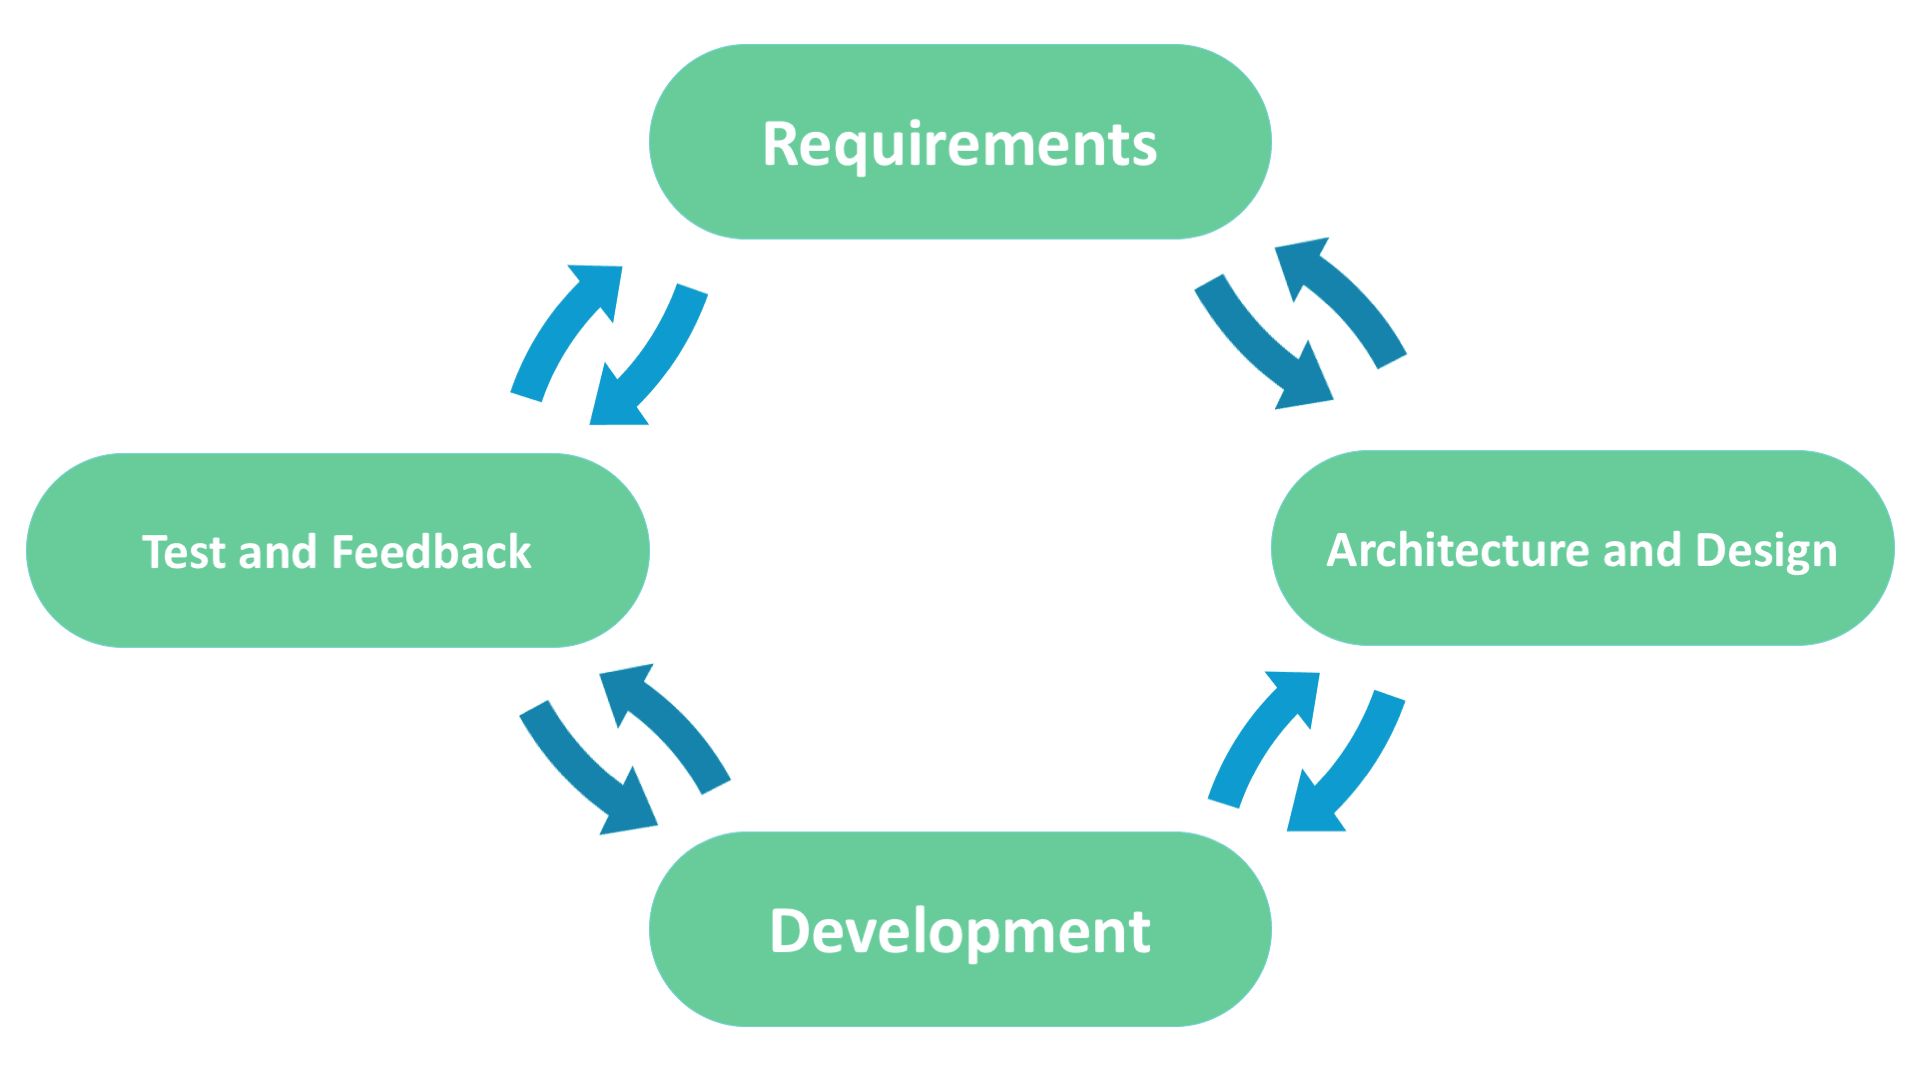 SDLC Models Explained: Agile, Waterfall, V-Shaped, Iterative